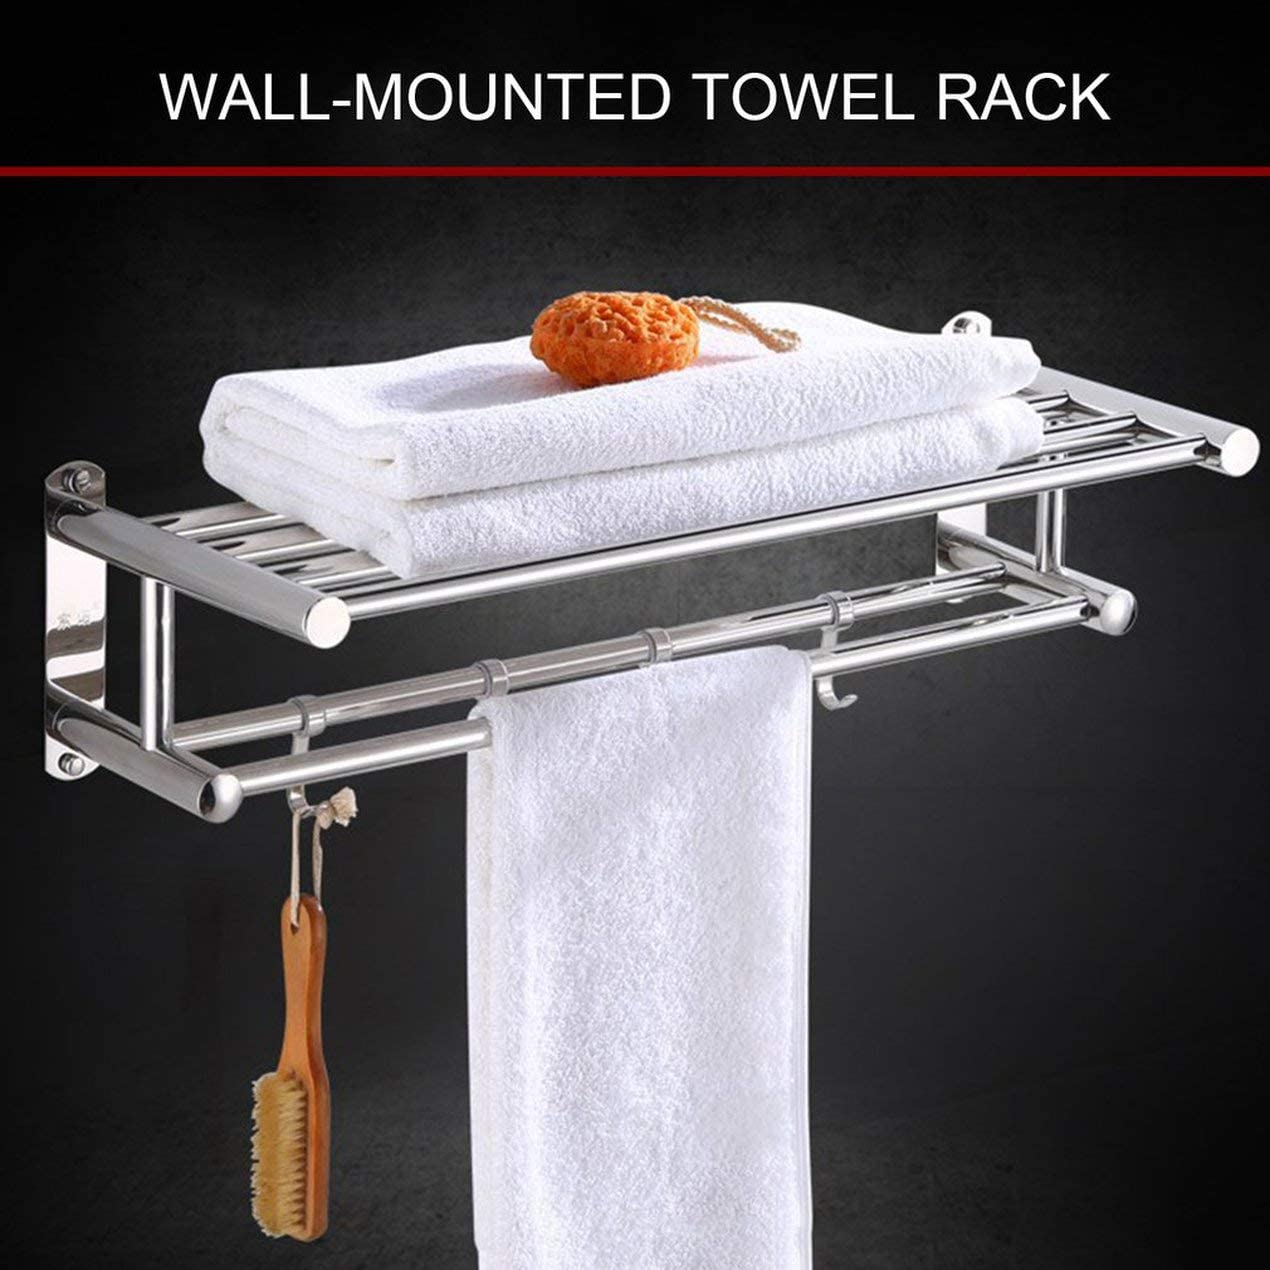 Bathroom Towel Holder Bathroom Organizer Stainless Steel Wall-Mounted Towel Rack Home Hotel Wall Shelf Hardware Accessory